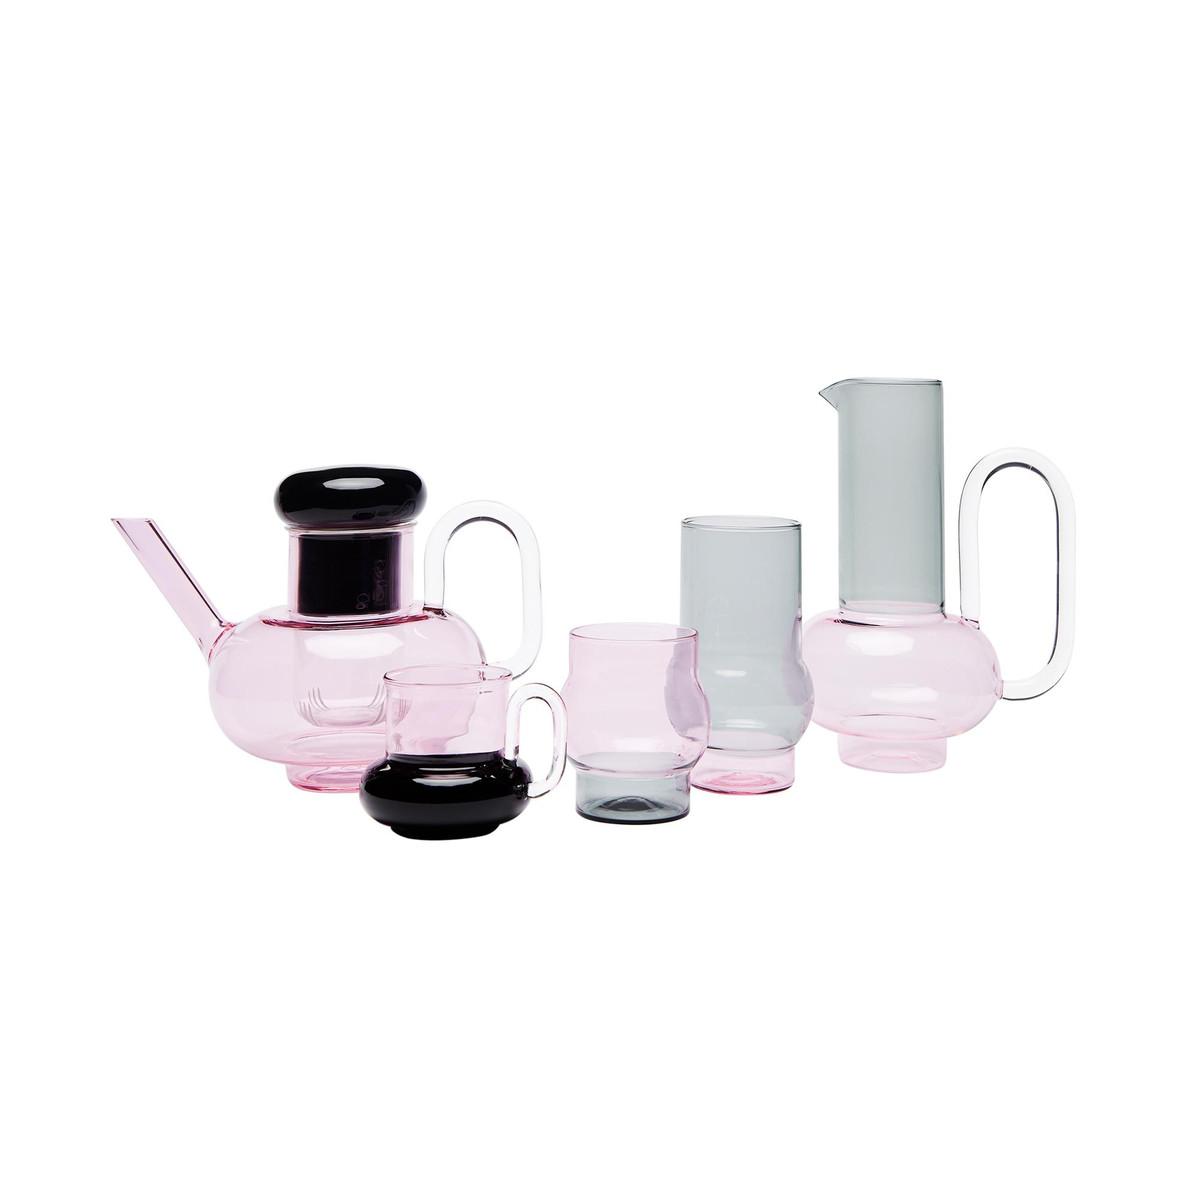 bump glass set of 2 tom dixon. Black Bedroom Furniture Sets. Home Design Ideas